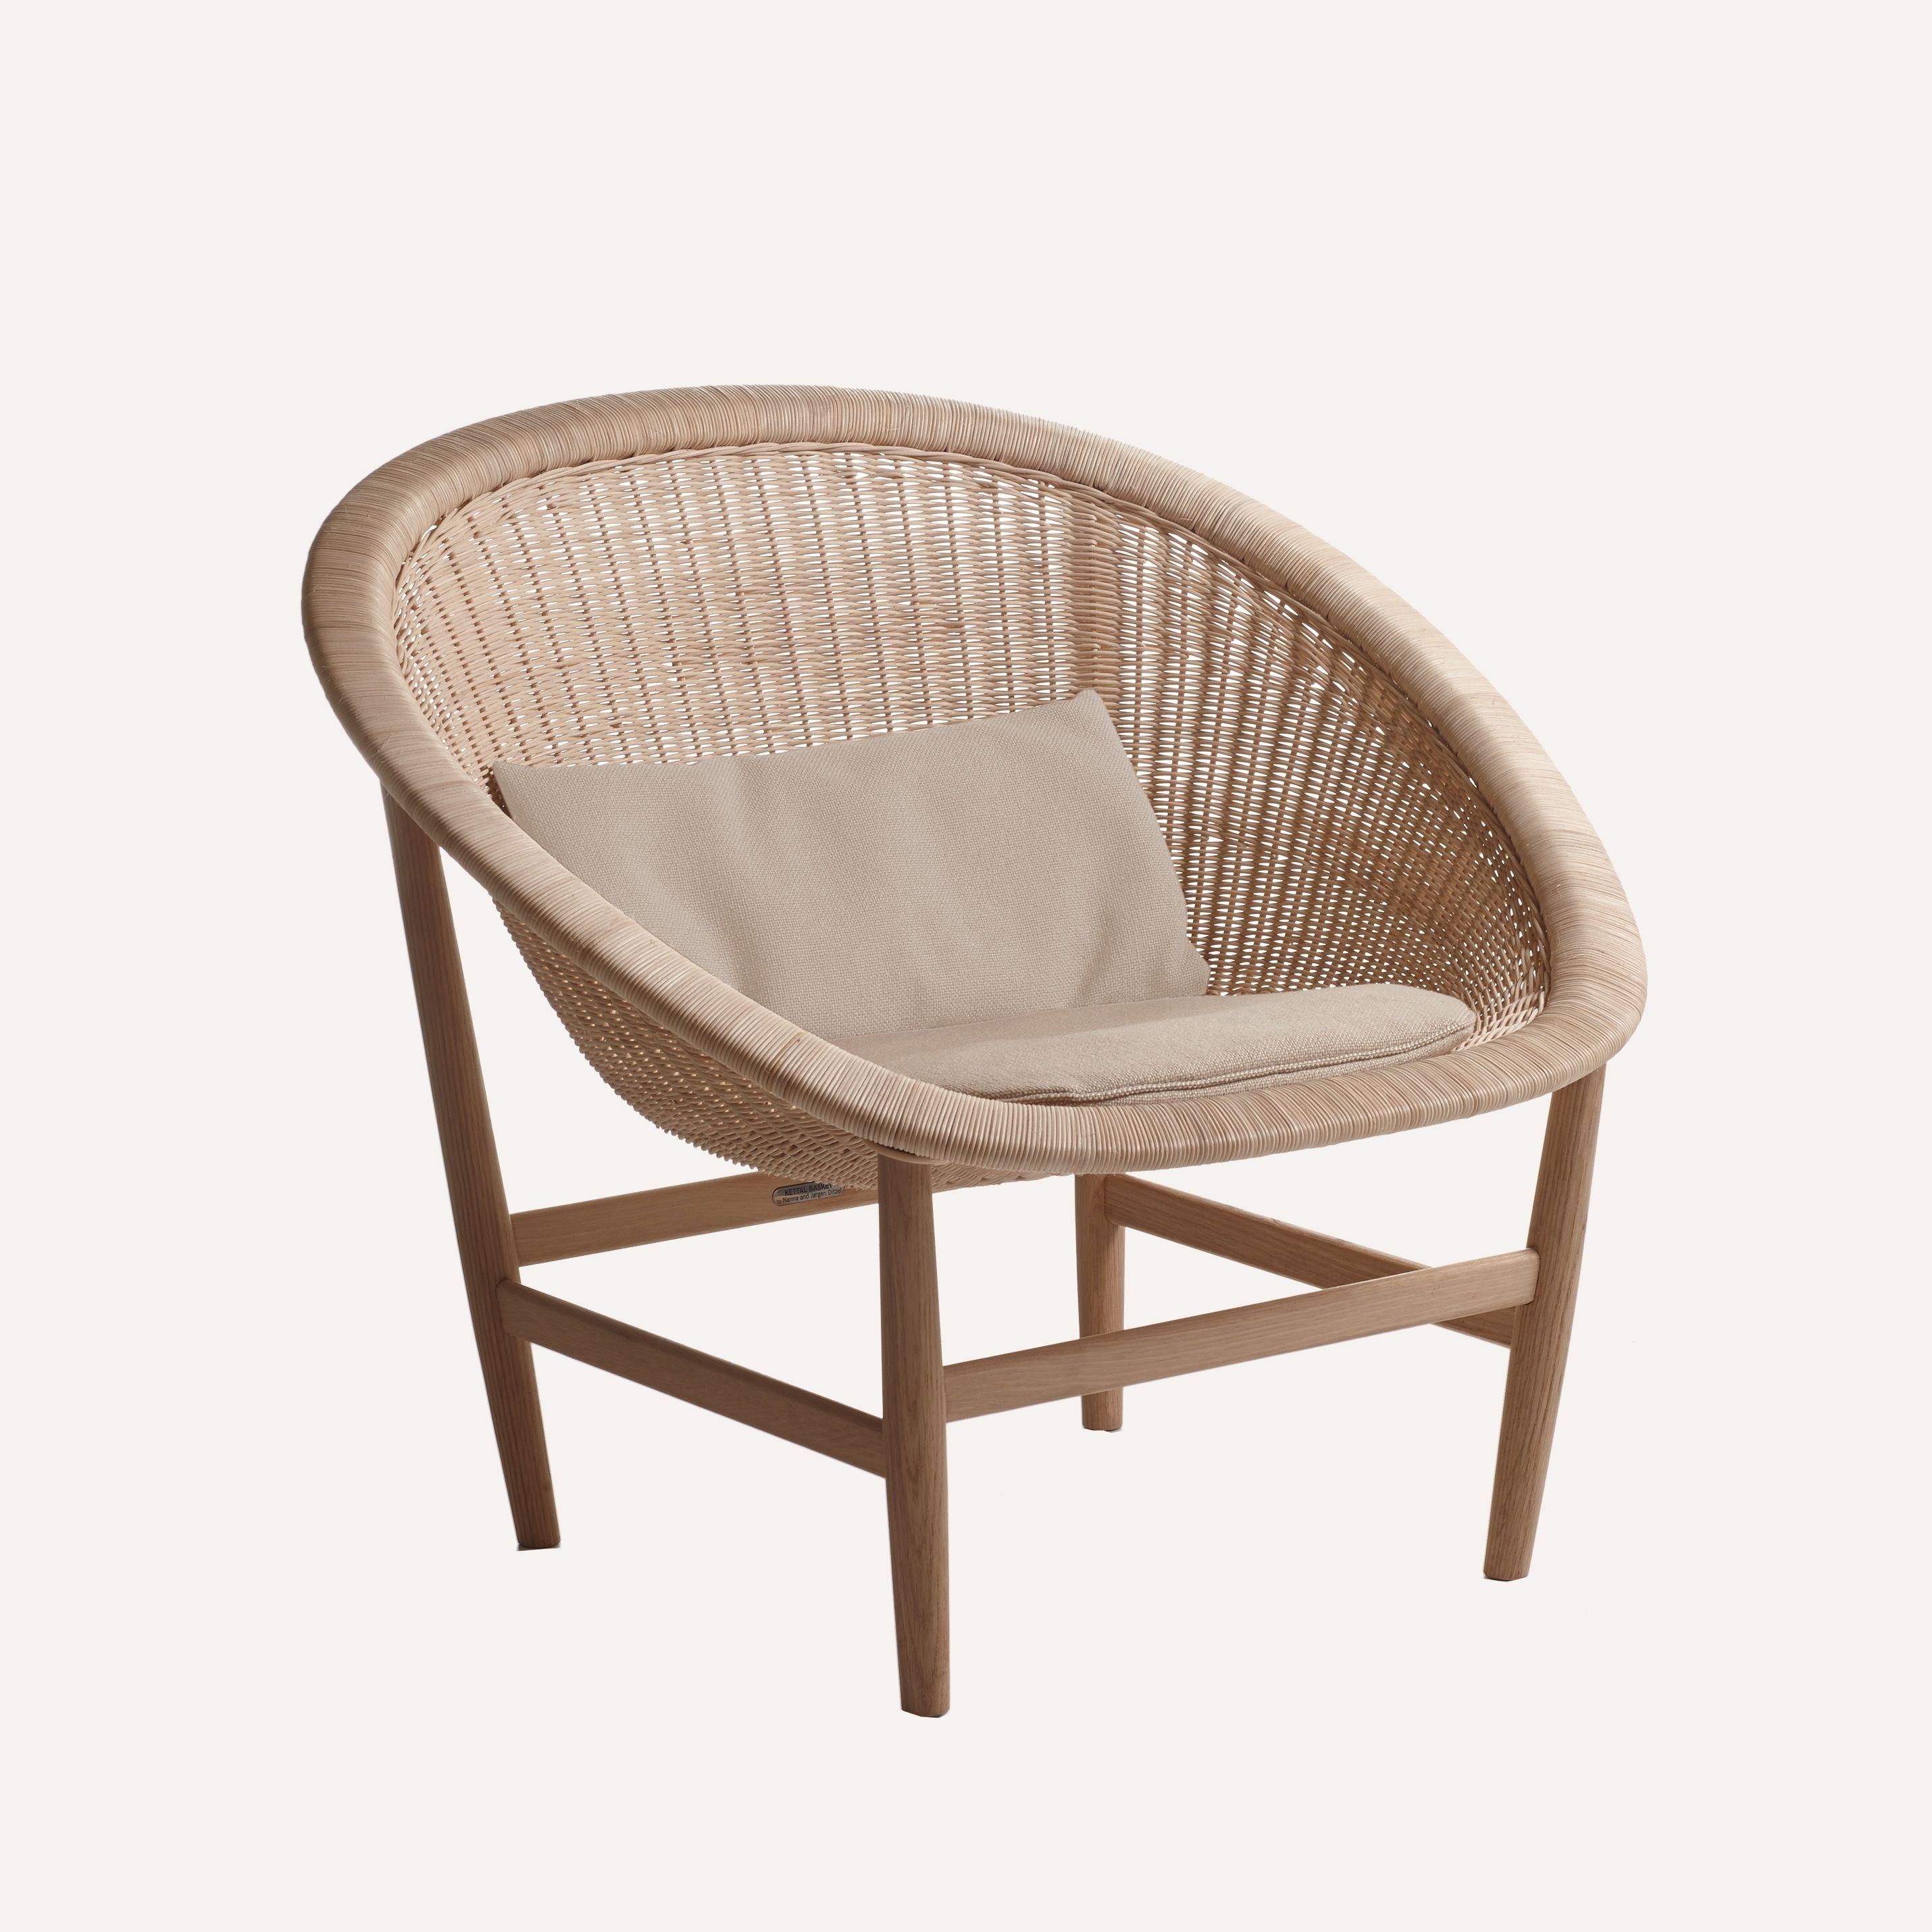 Kettal   Basket   Outdoor Basket Armchair